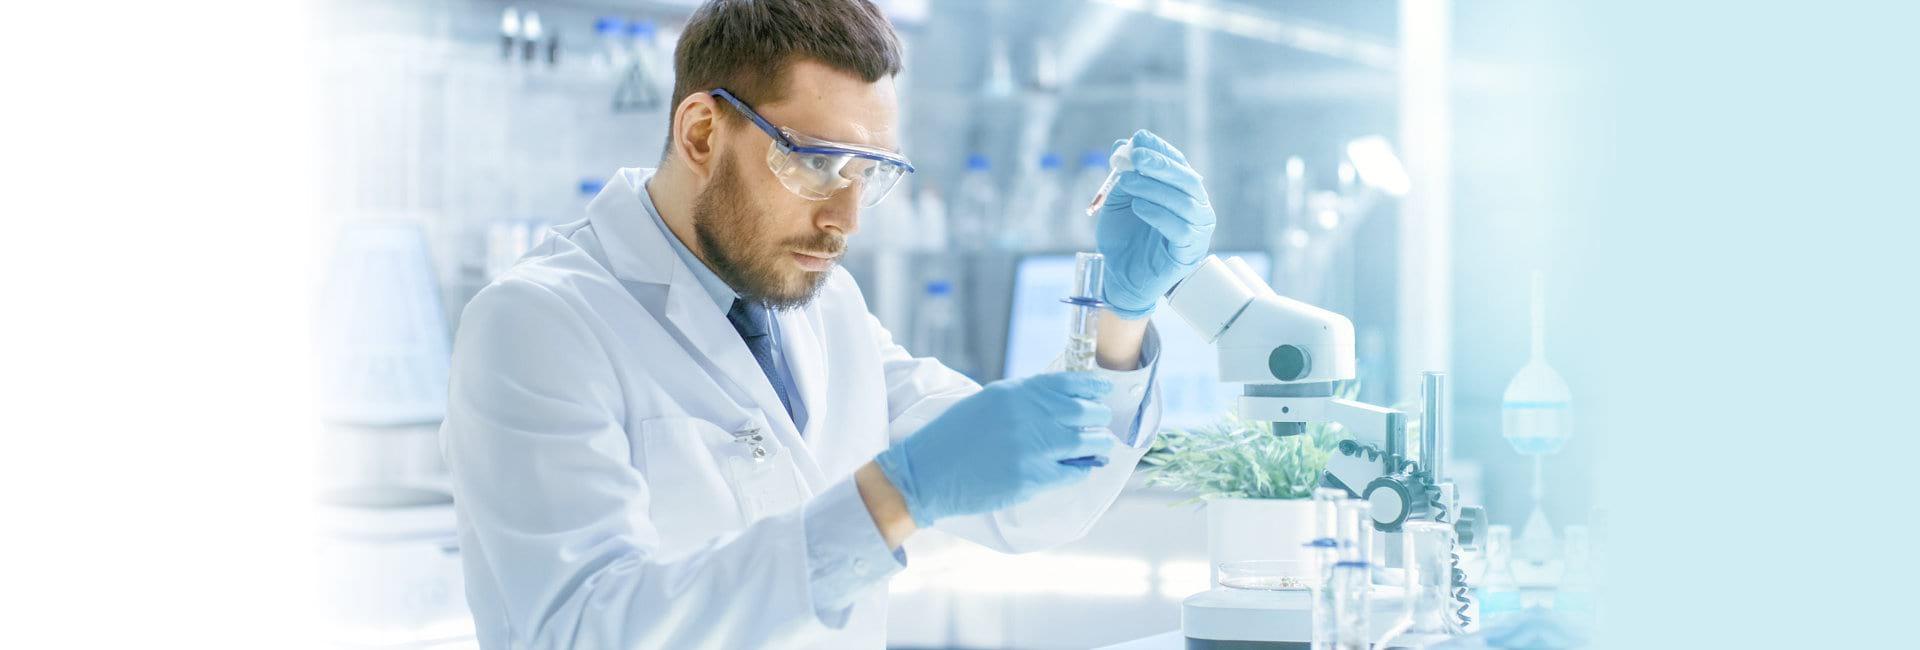 pharmacist compounding a medicine